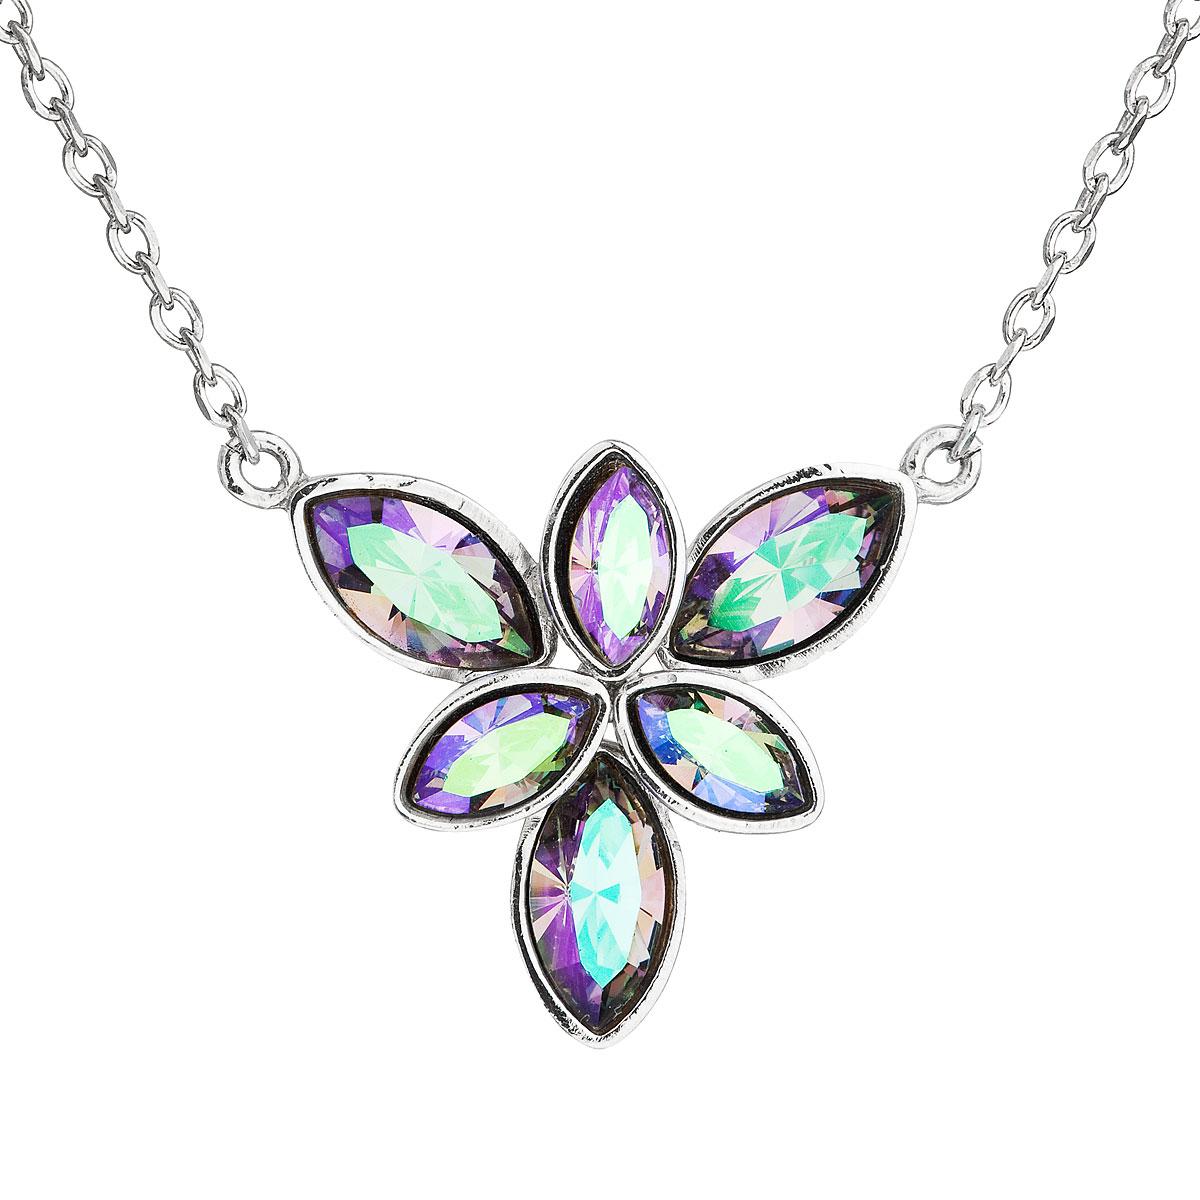 Evolution Group Stříbrný náhrdelník s krystaly Swarovski modrá kytička 32047.5